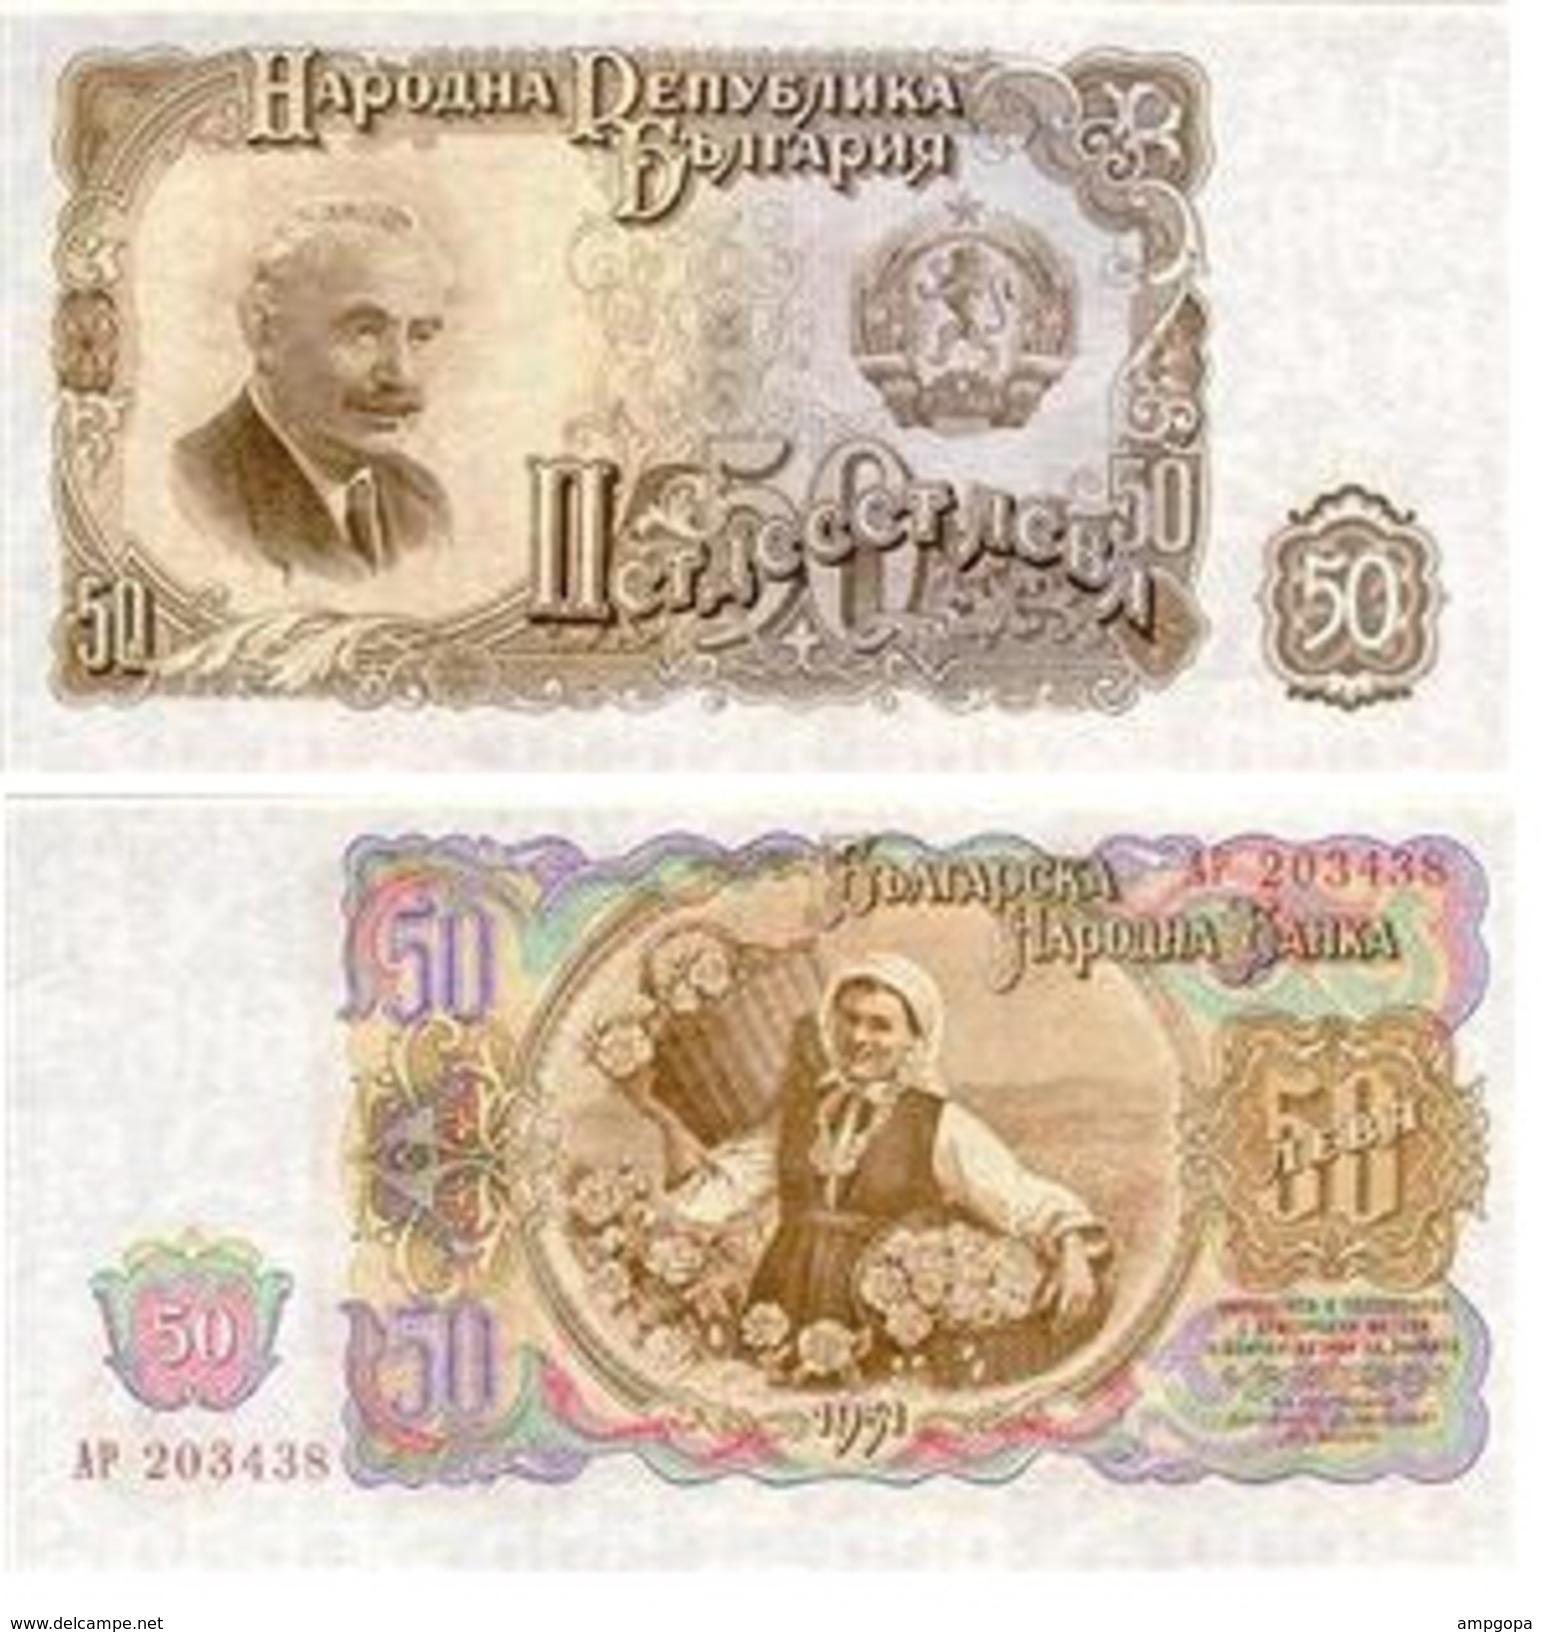 Bulgaria 50 Levas 1951 Pick 85.a UNC - Bulgaria